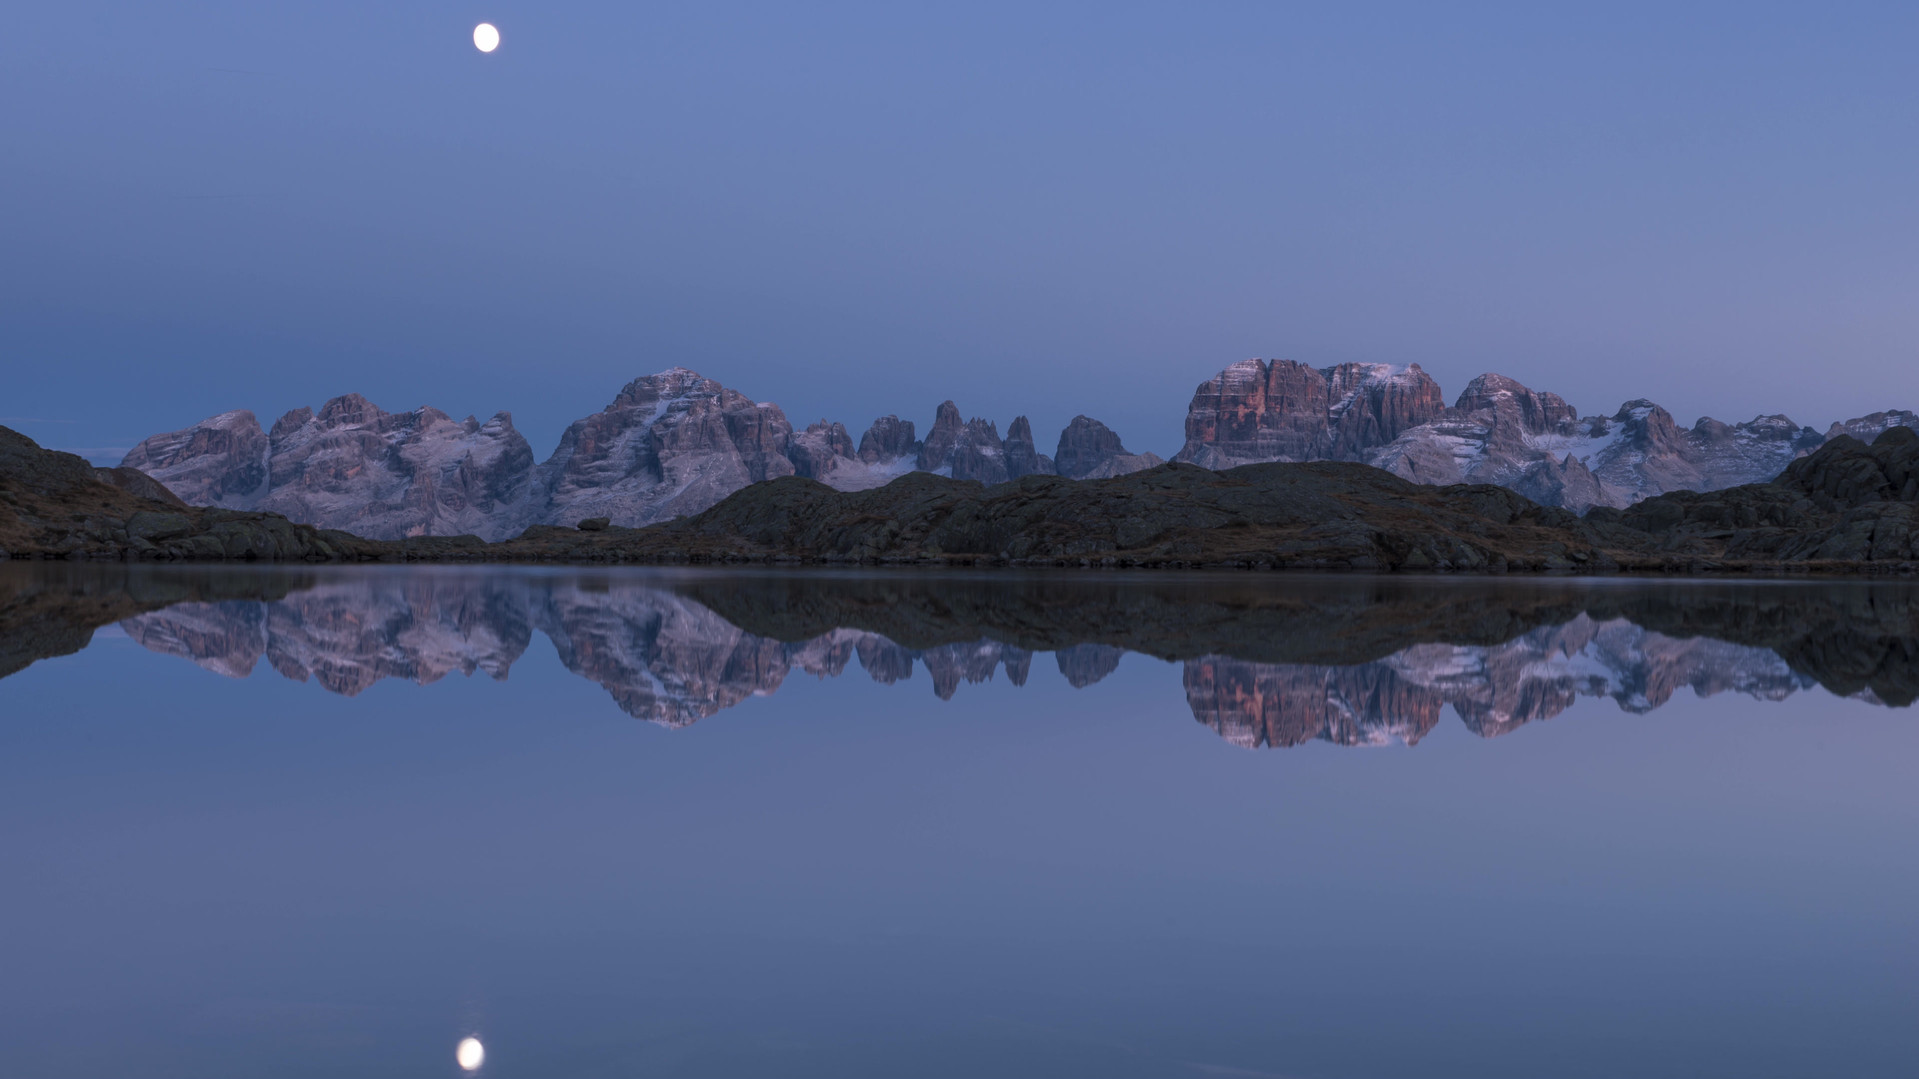 Lago nero luna 4k.mp4